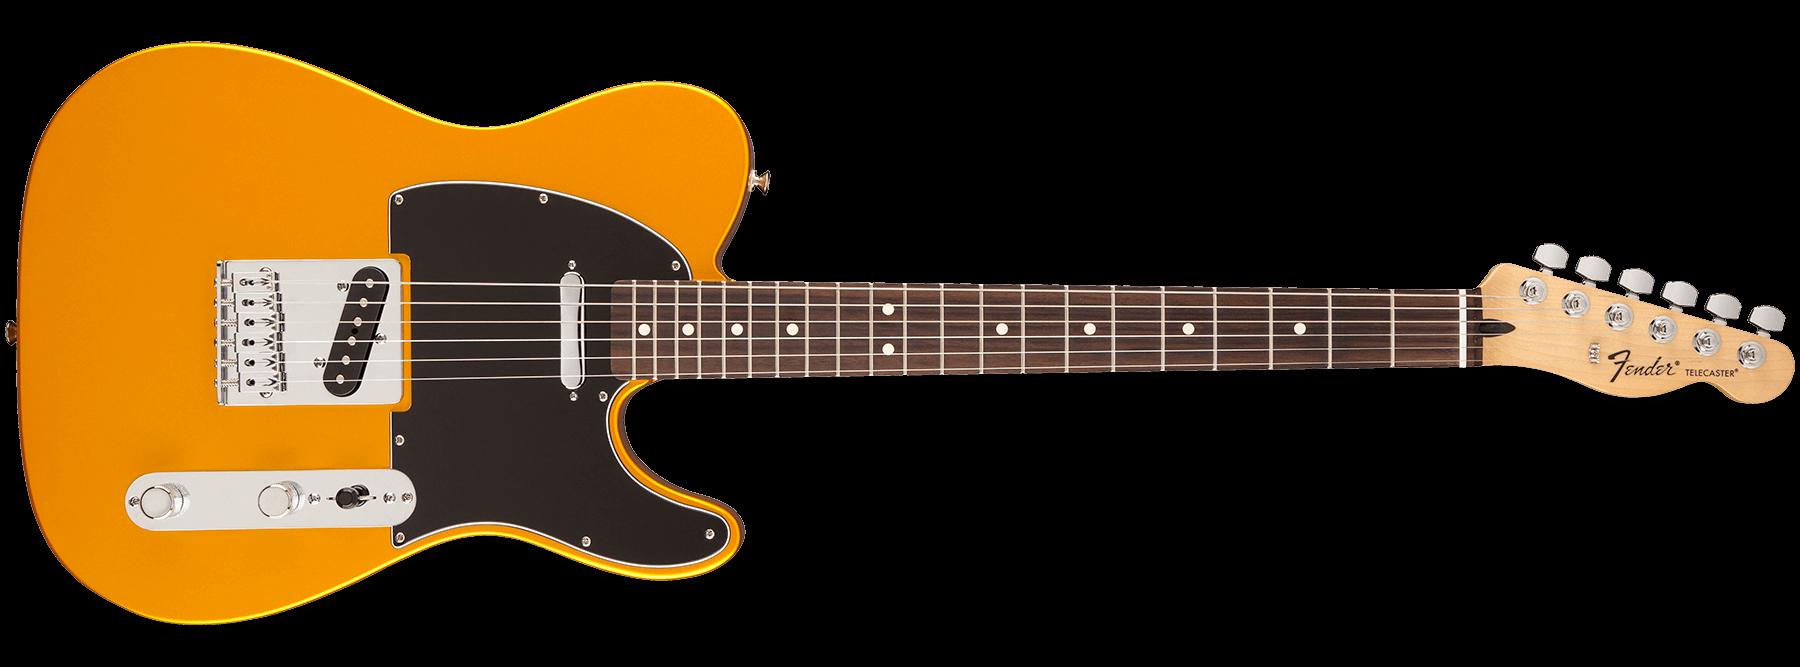 Fender Standard Telecaster Satin Blaze Gold